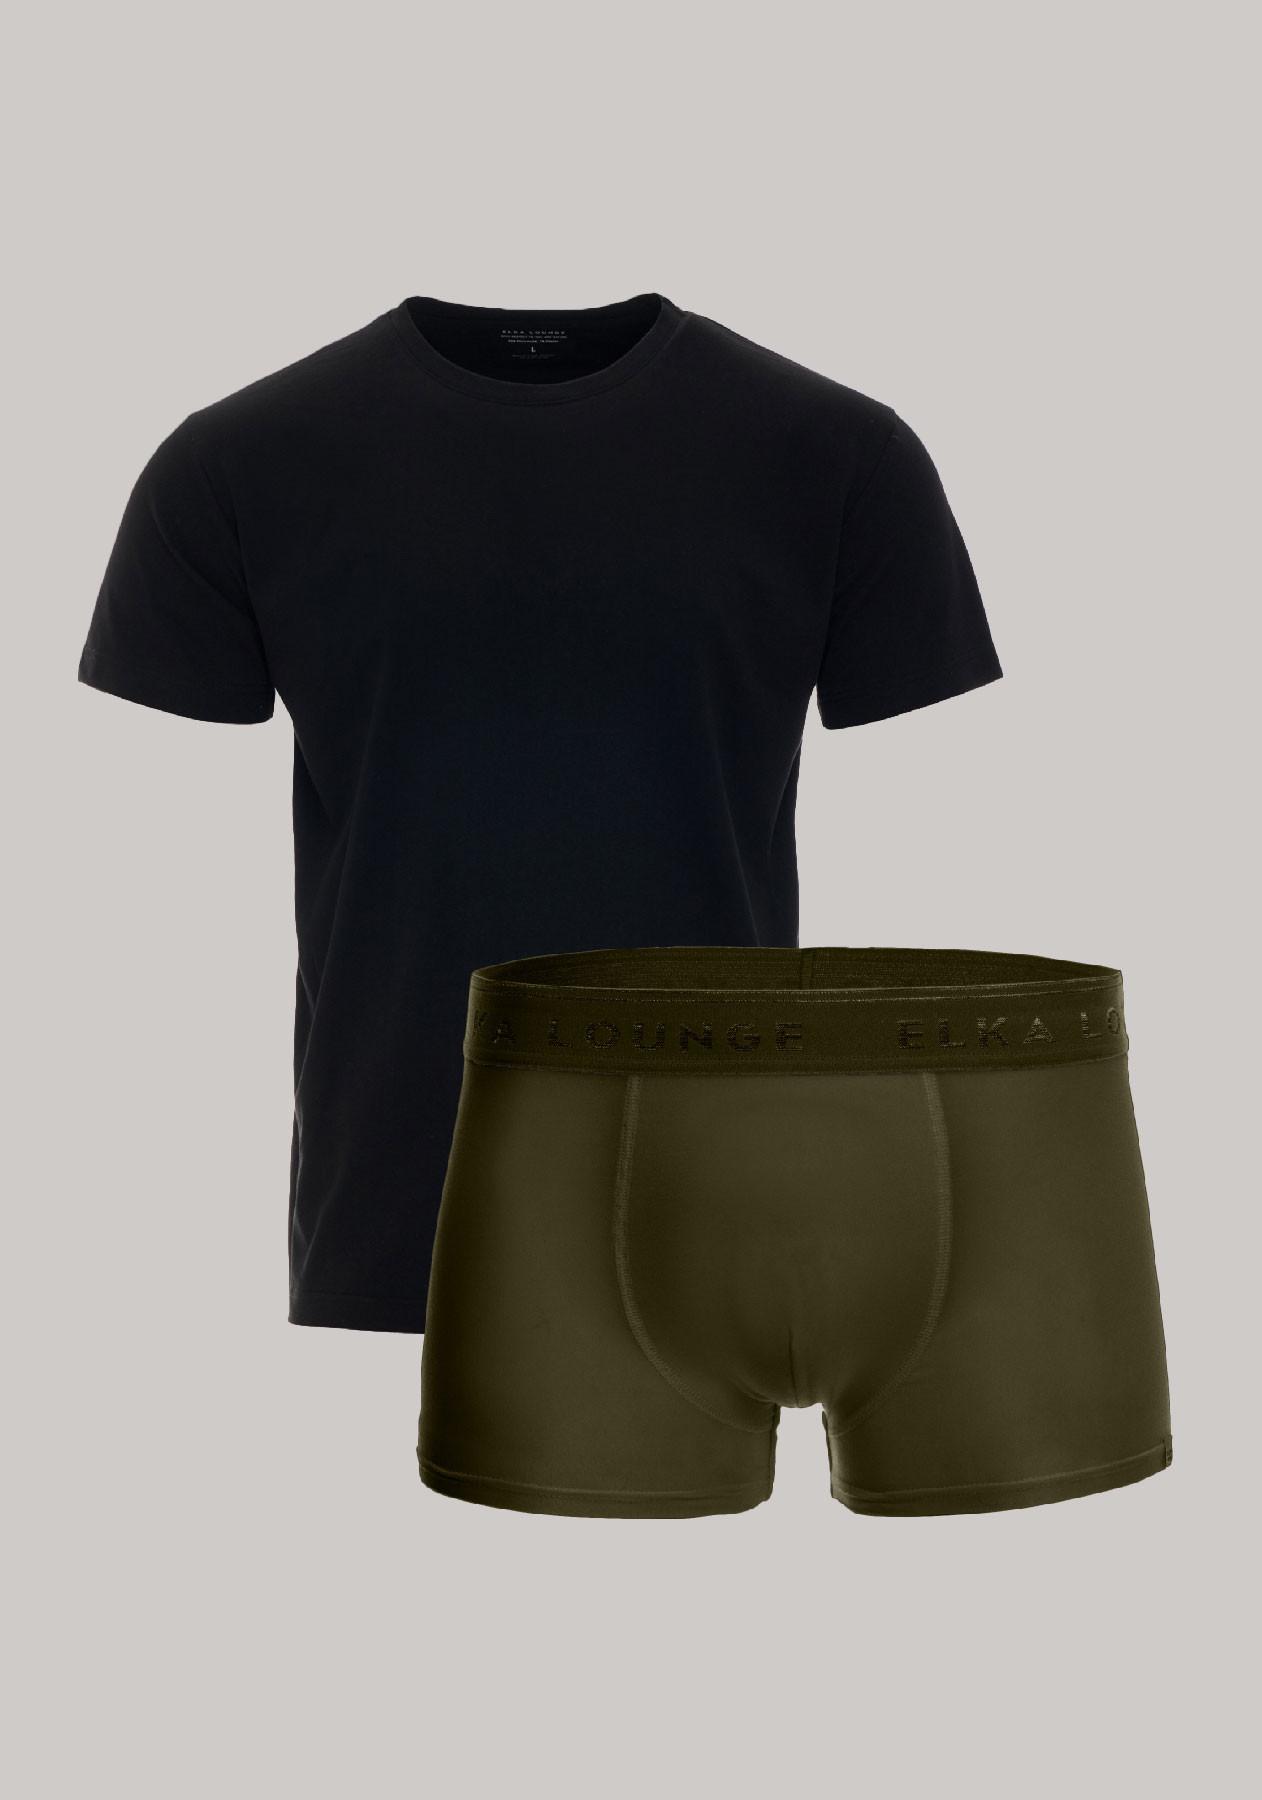 Men-T-shirt, boxers-ELKA-Lounge-M00541,561